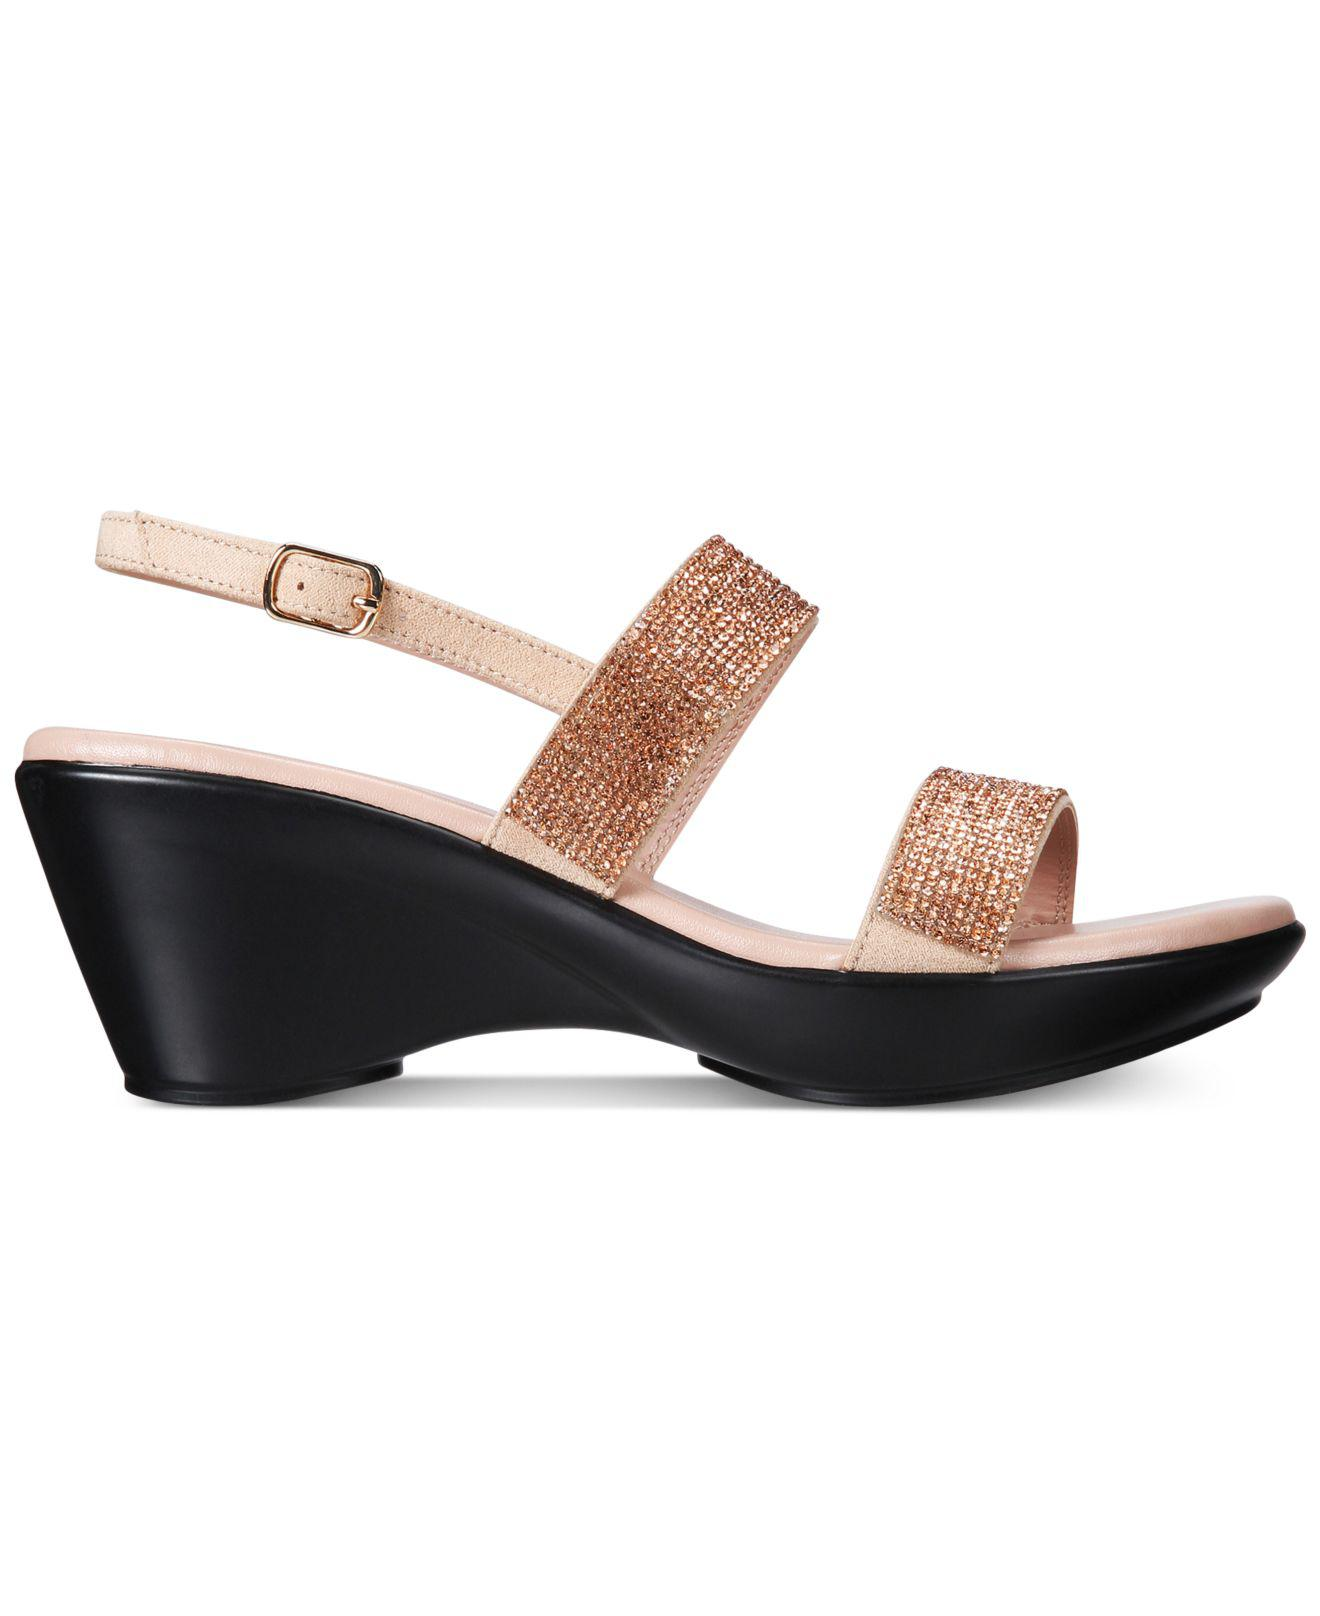 Callisto Simion Embellished Wedge Sandals Women's Shoes ulSCWk